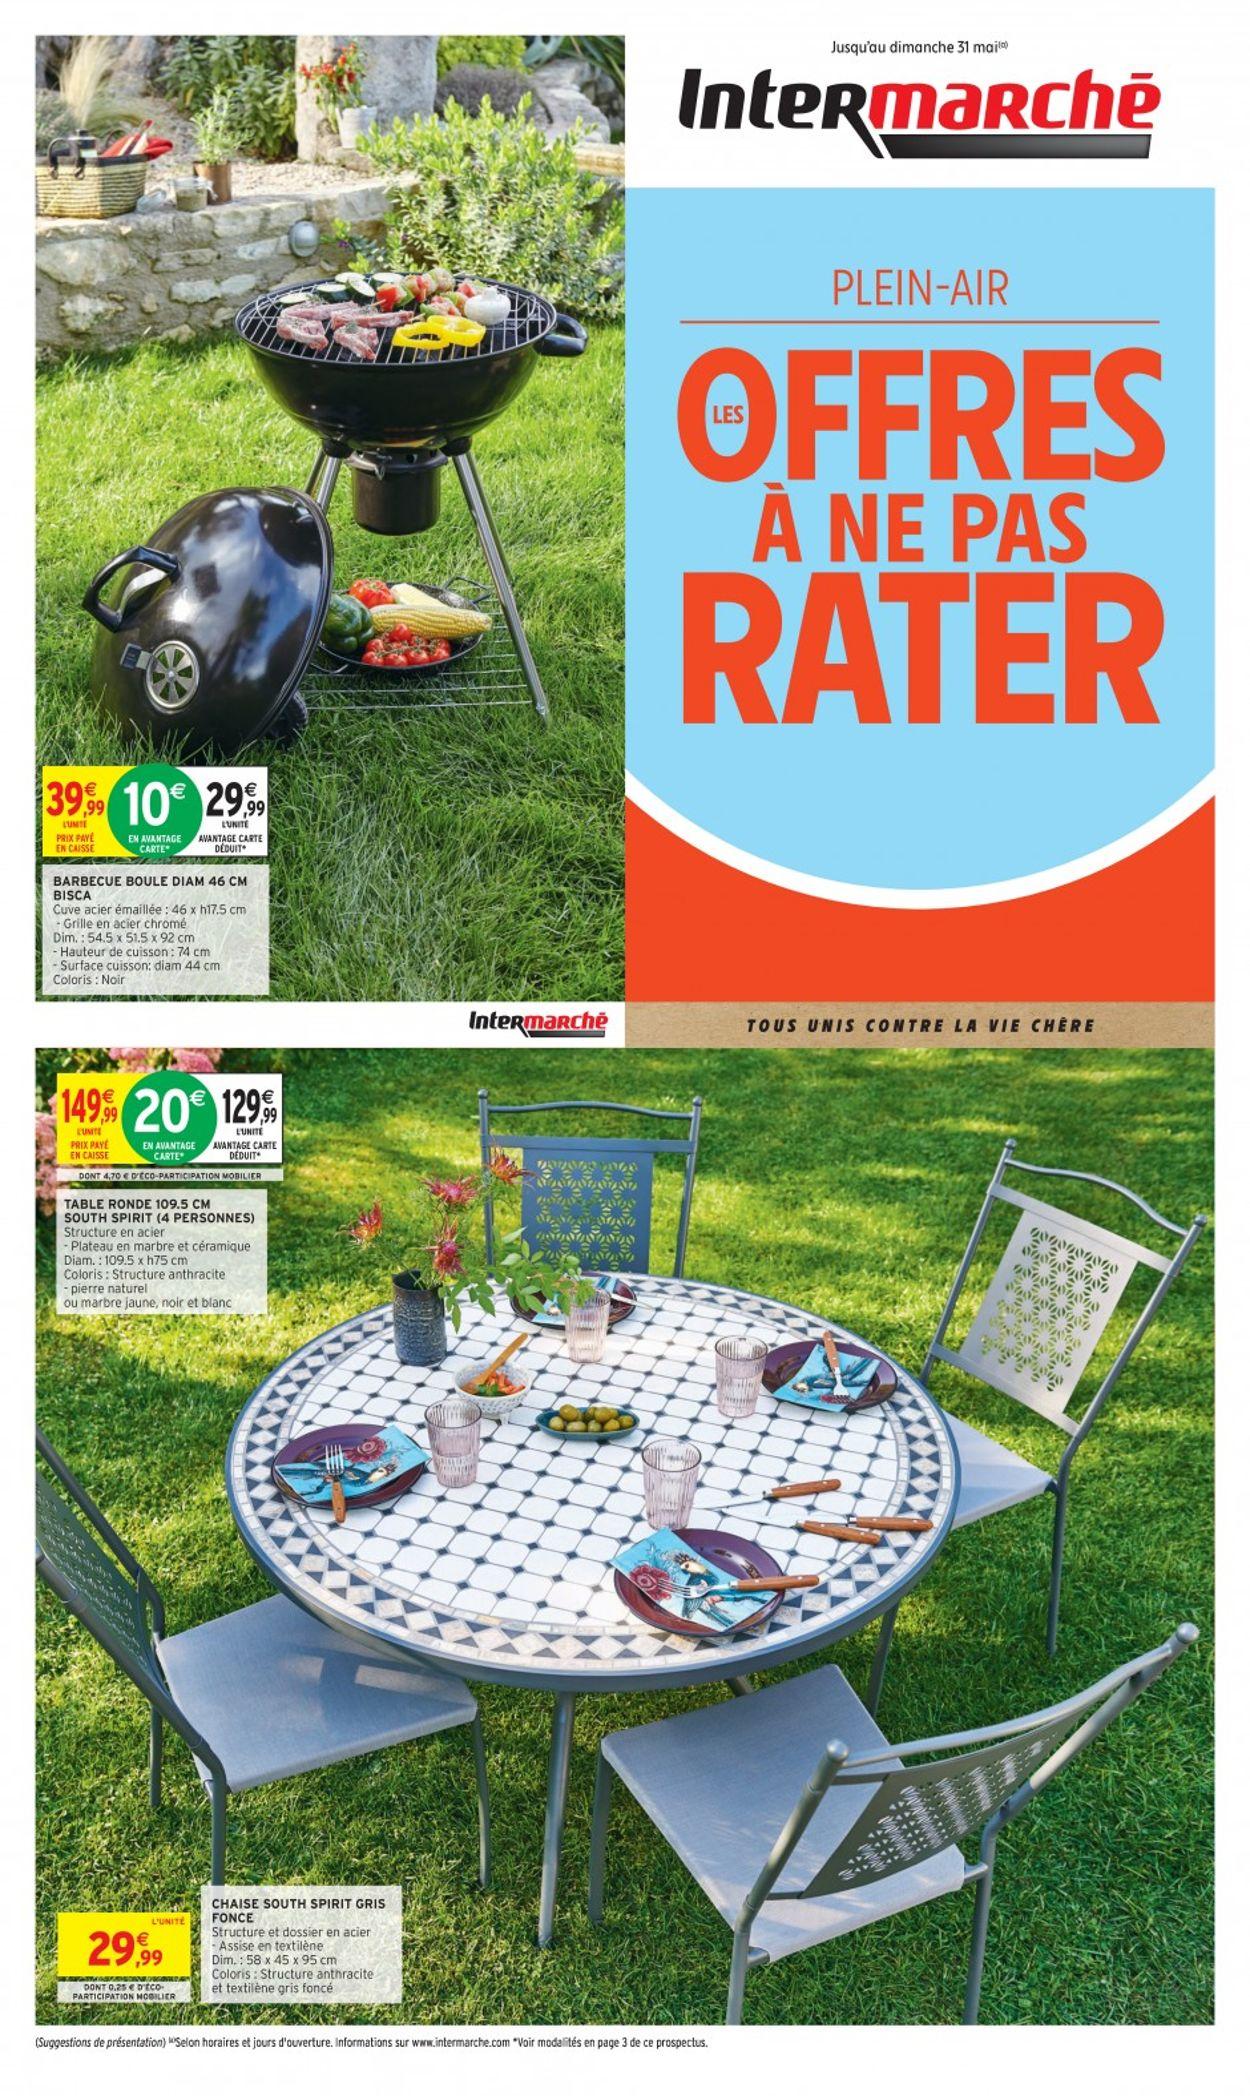 Intermarché Catalogue - 26.05-31.05.2020